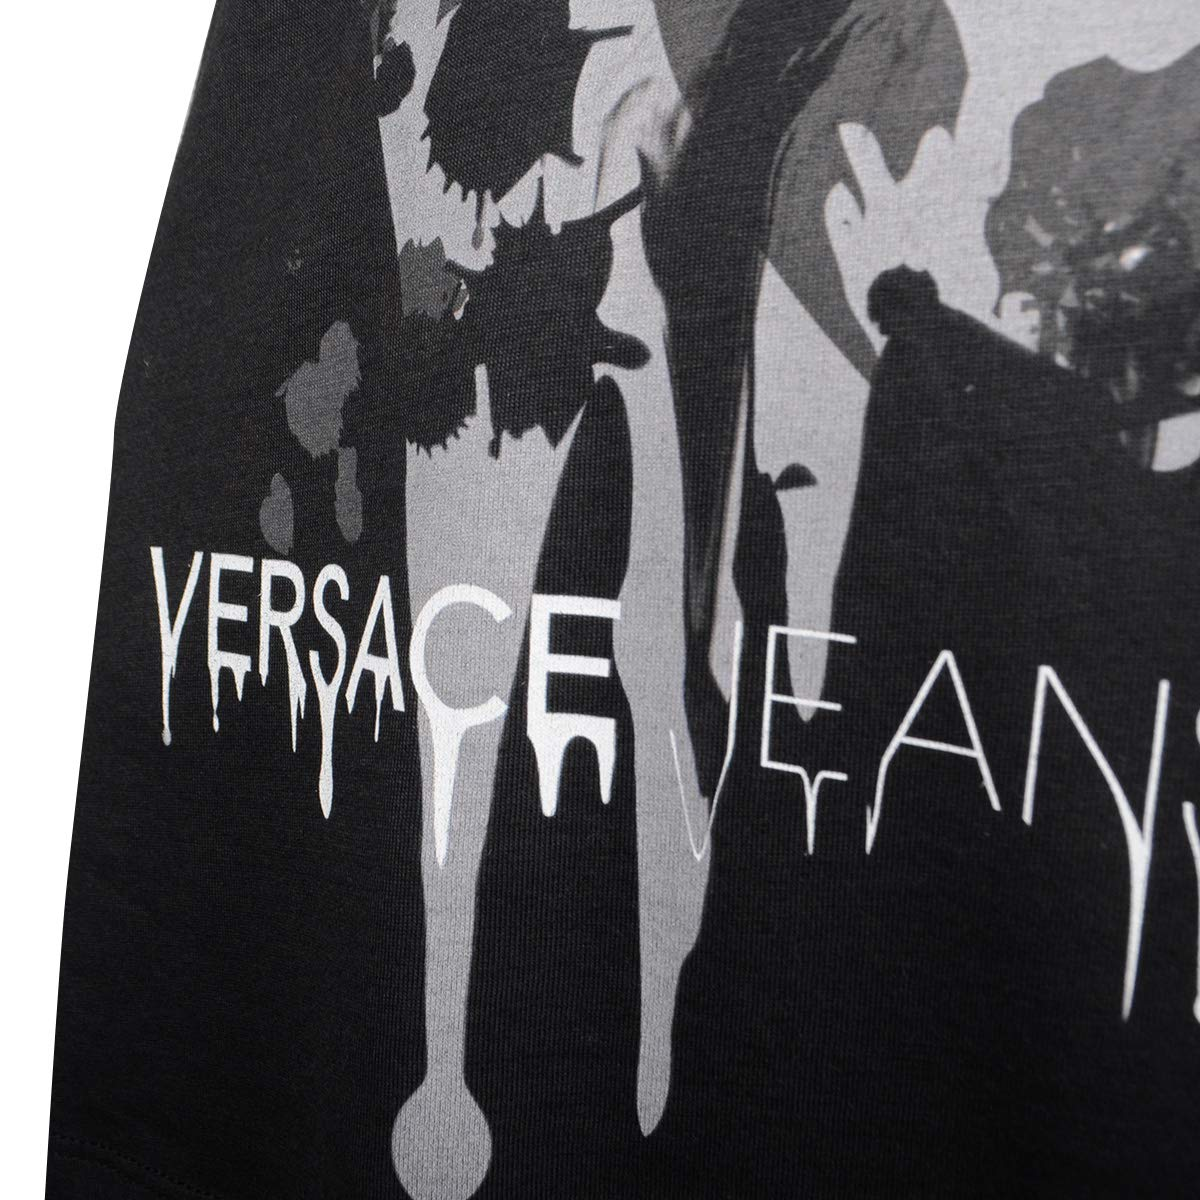 Versace Jeans Jeans Jeans T-Shirt Art nero - B2HOA7A2   Art nero - Dimensione 40 (EU) - IT44 c49a41